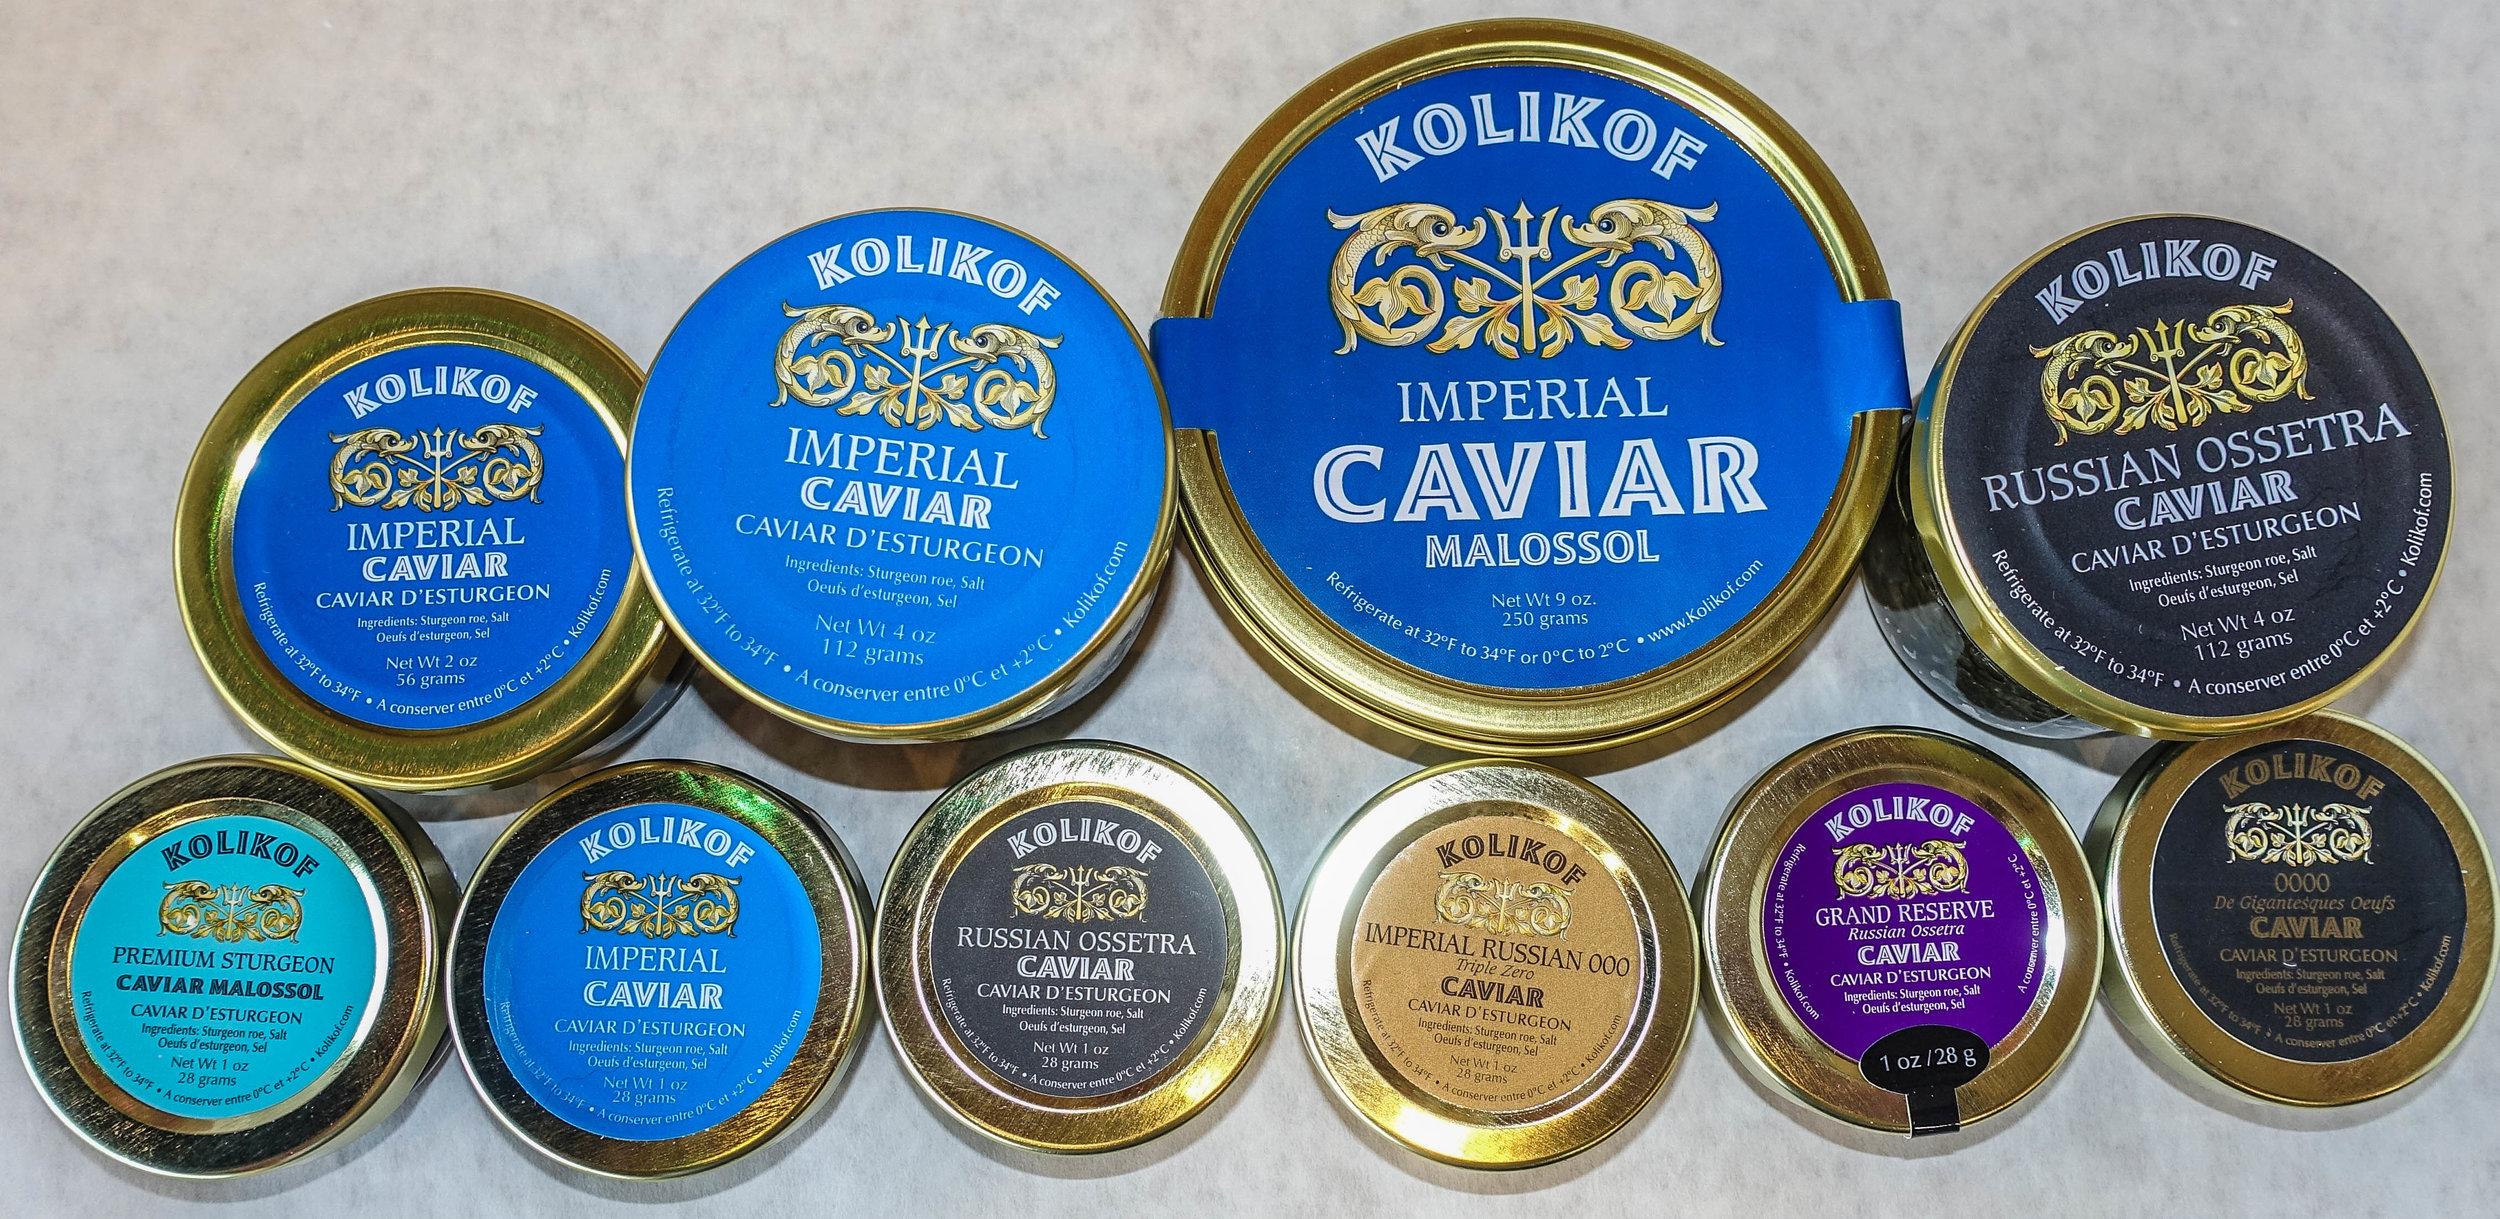 Caviar Display (1 of 1).jpg